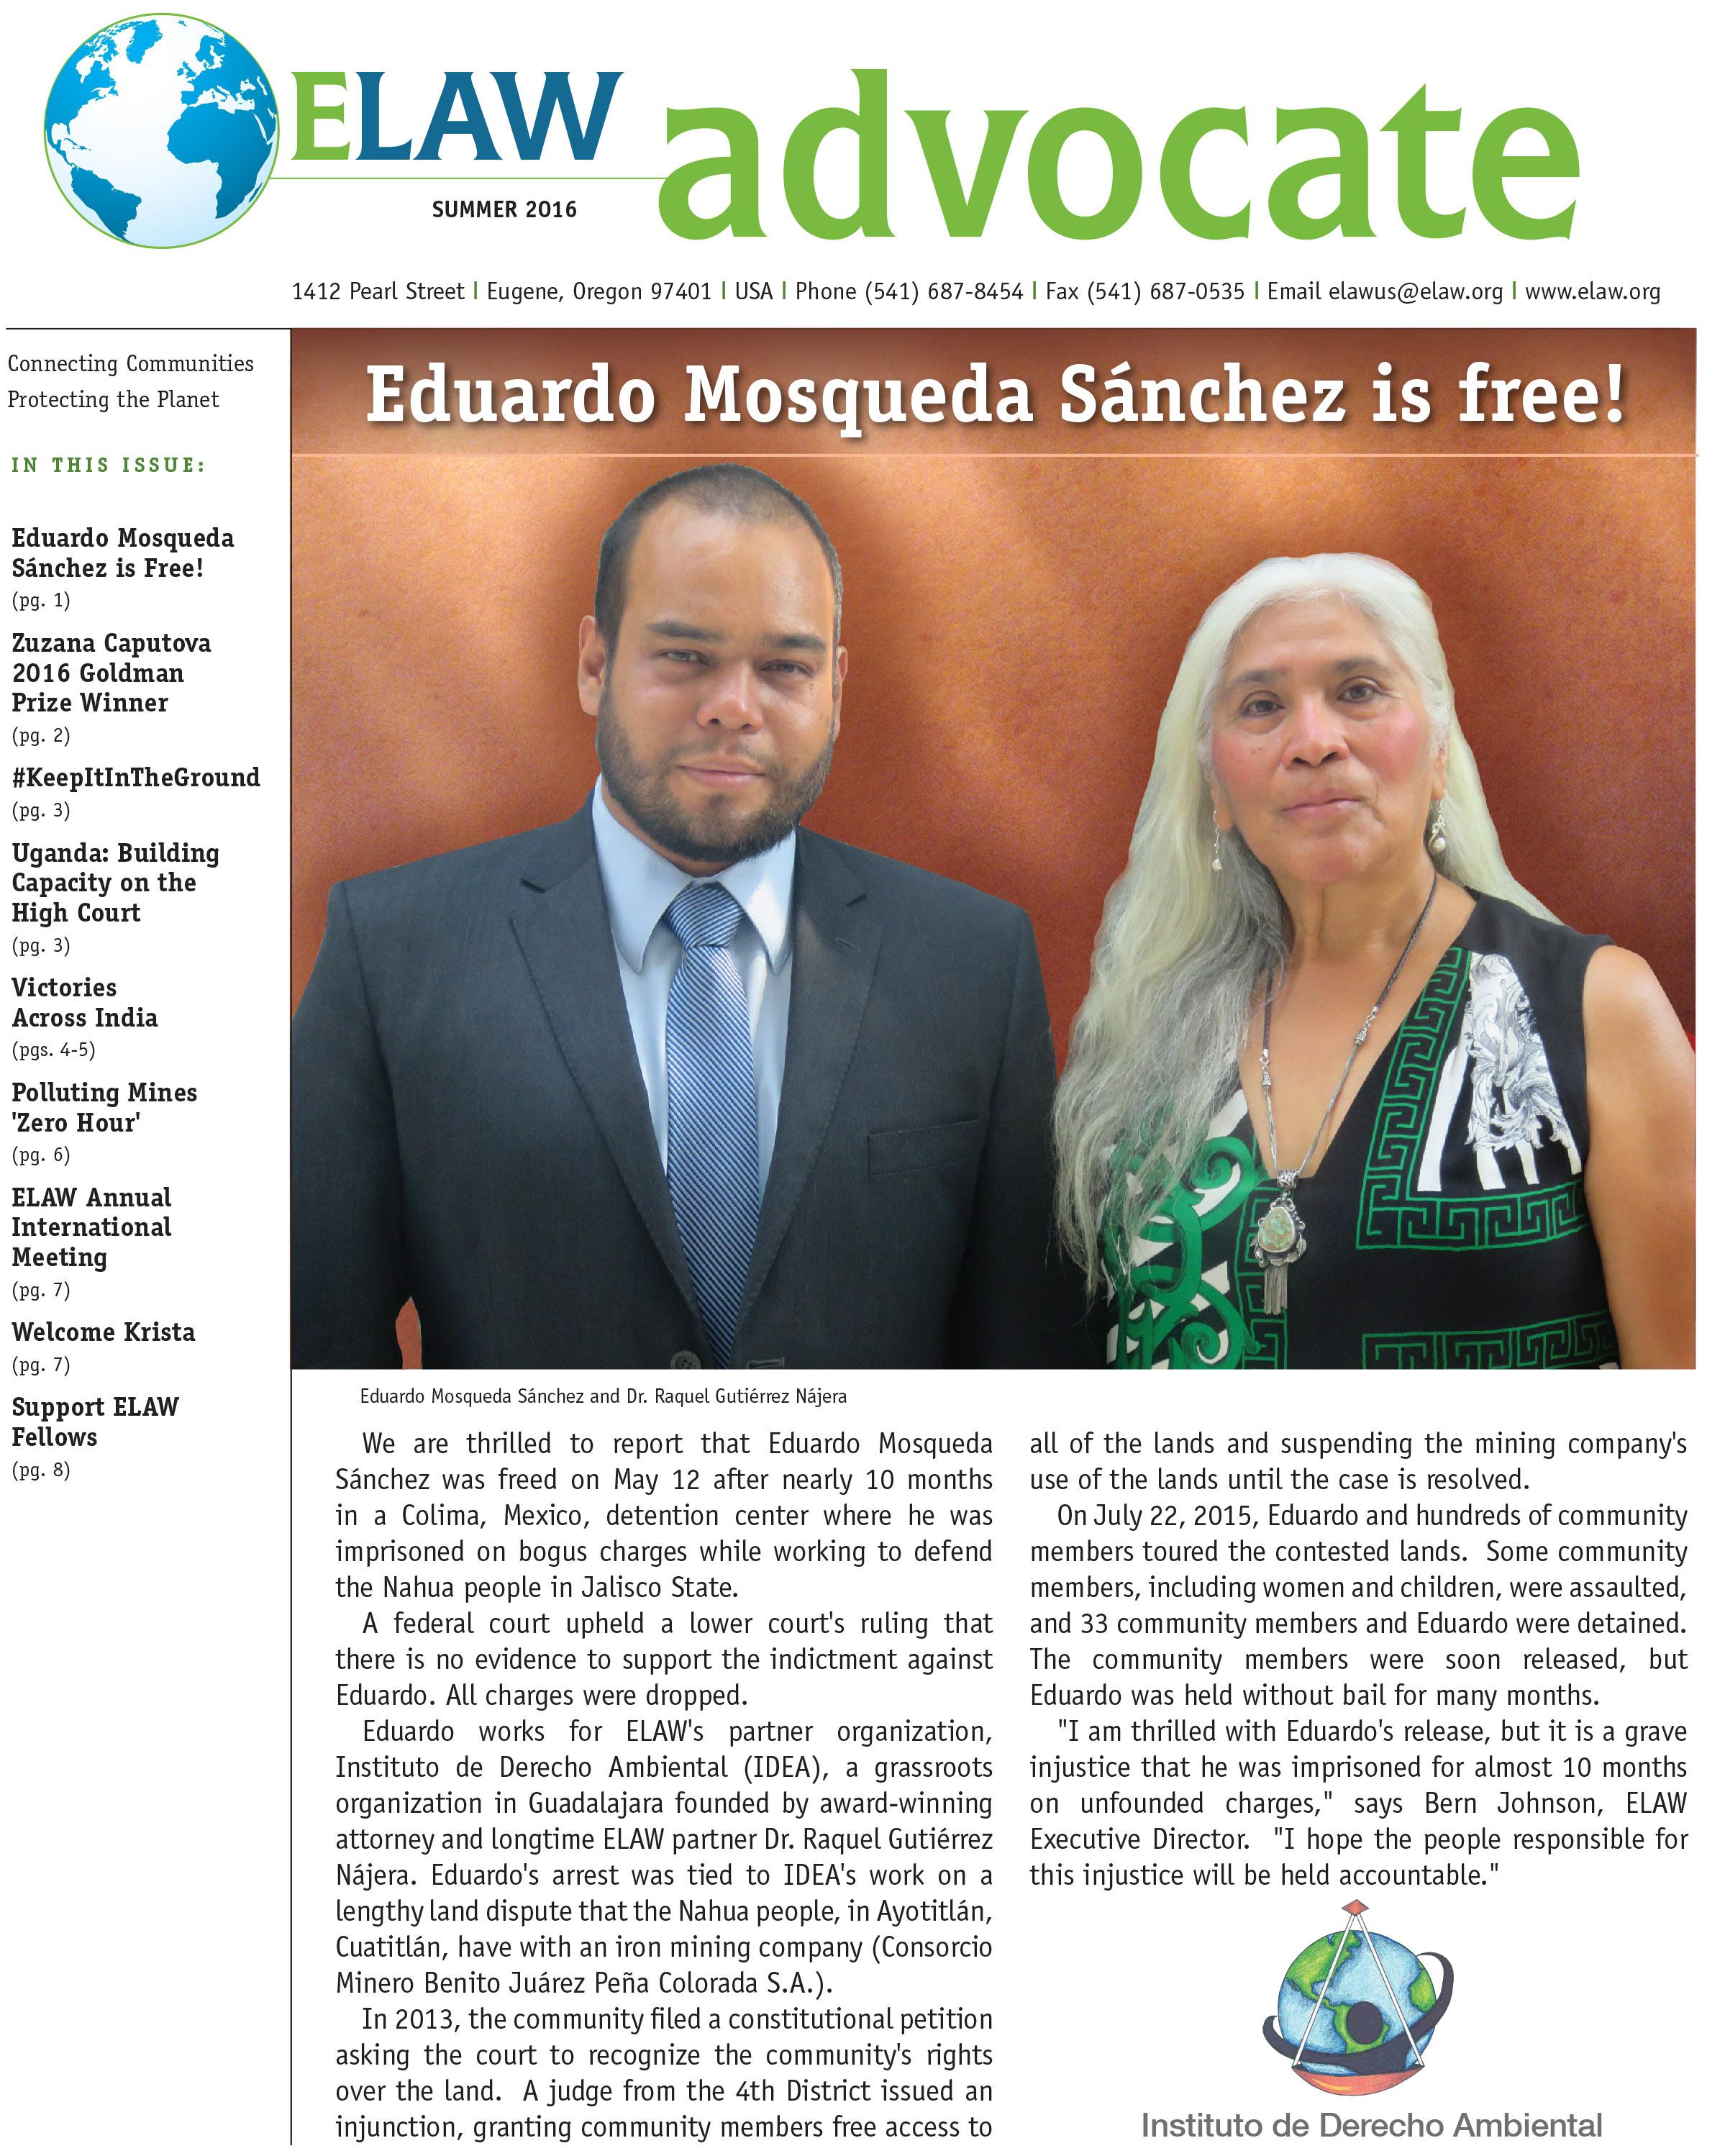 Eduardo Mosqueda Sánchez is Free, Summer 2016